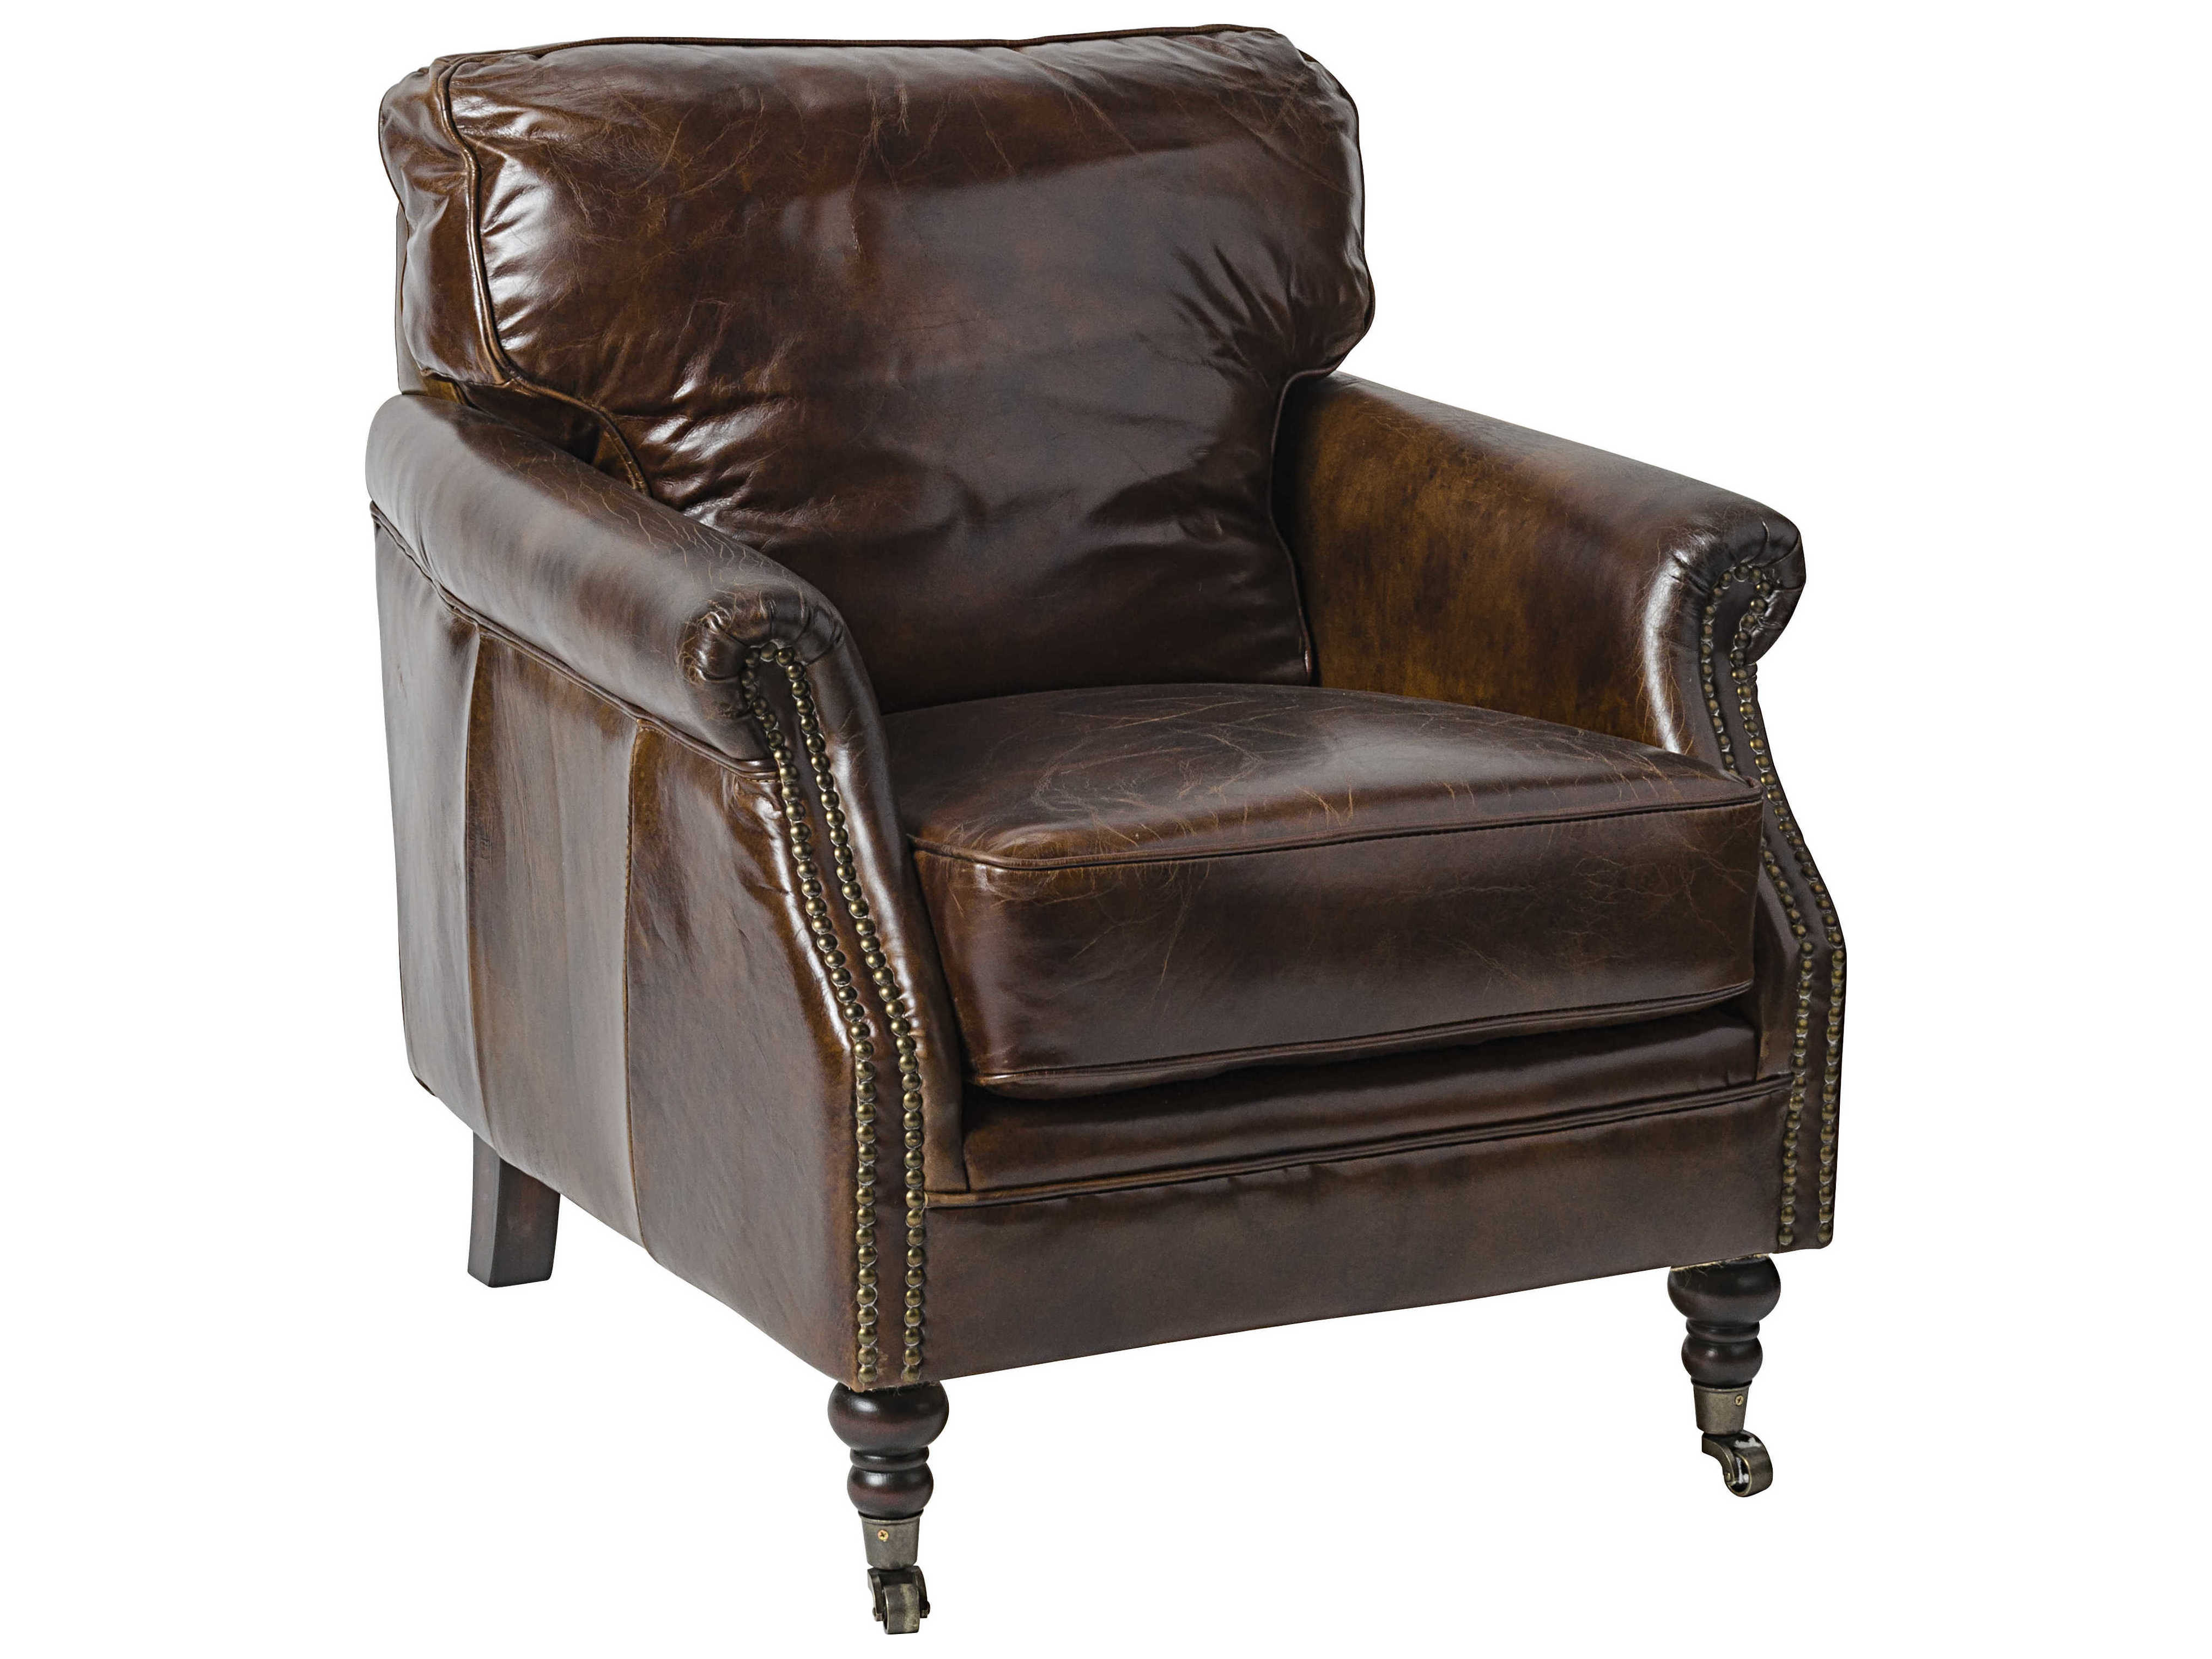 Noir Furniture 916 Vintage Leather Club Chair Noilea916